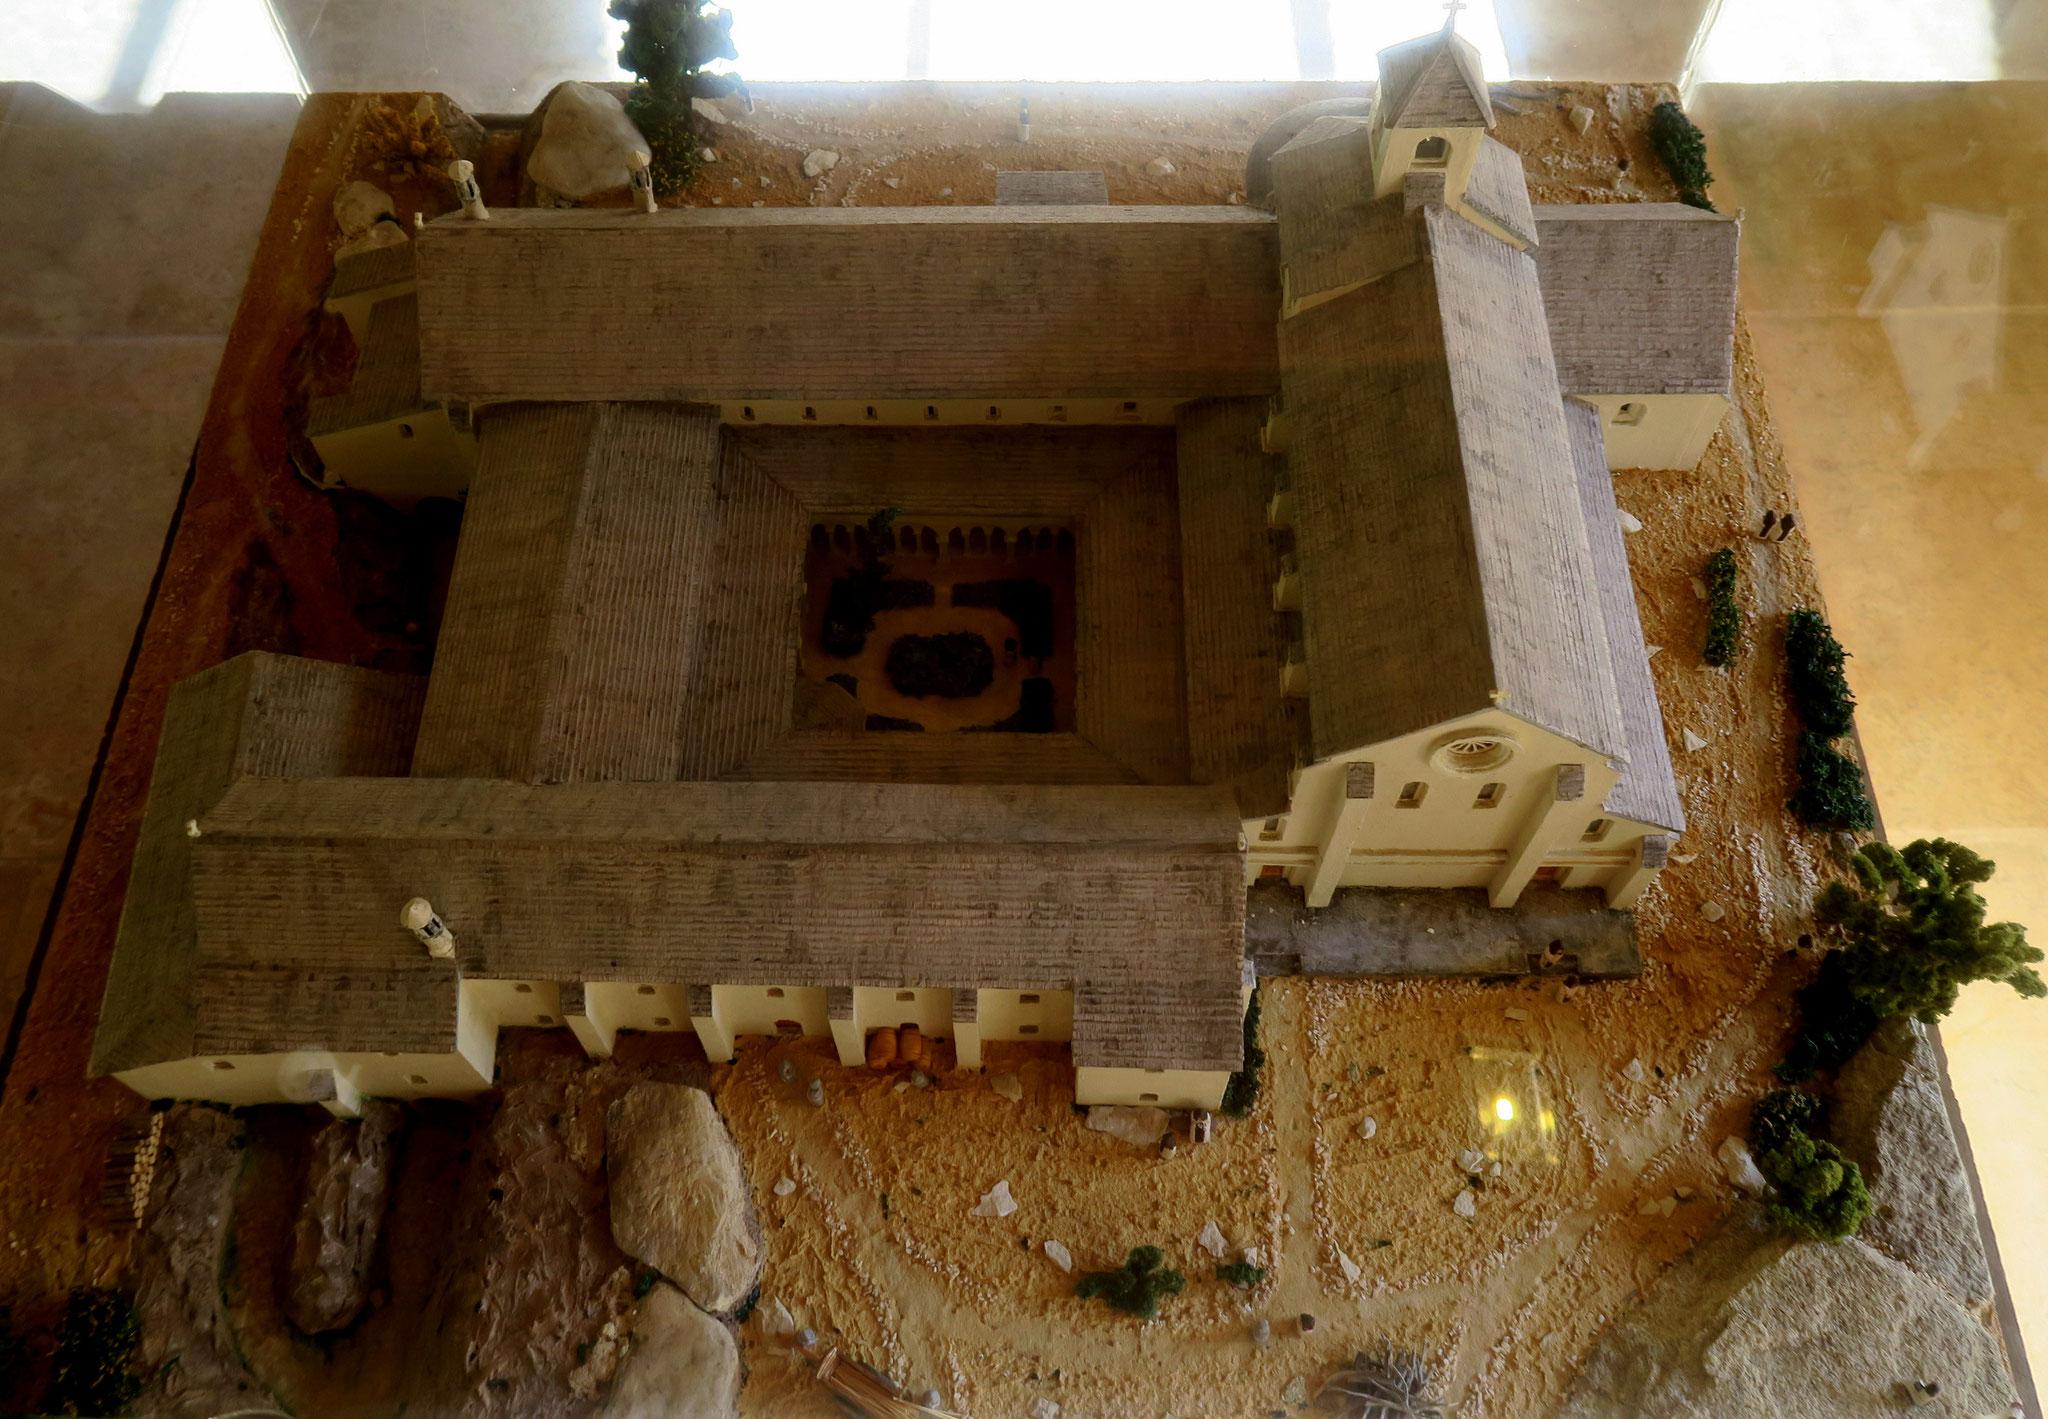 Bild: Modelle der Abbaye Notre-Dame de Sénanque, Gordes